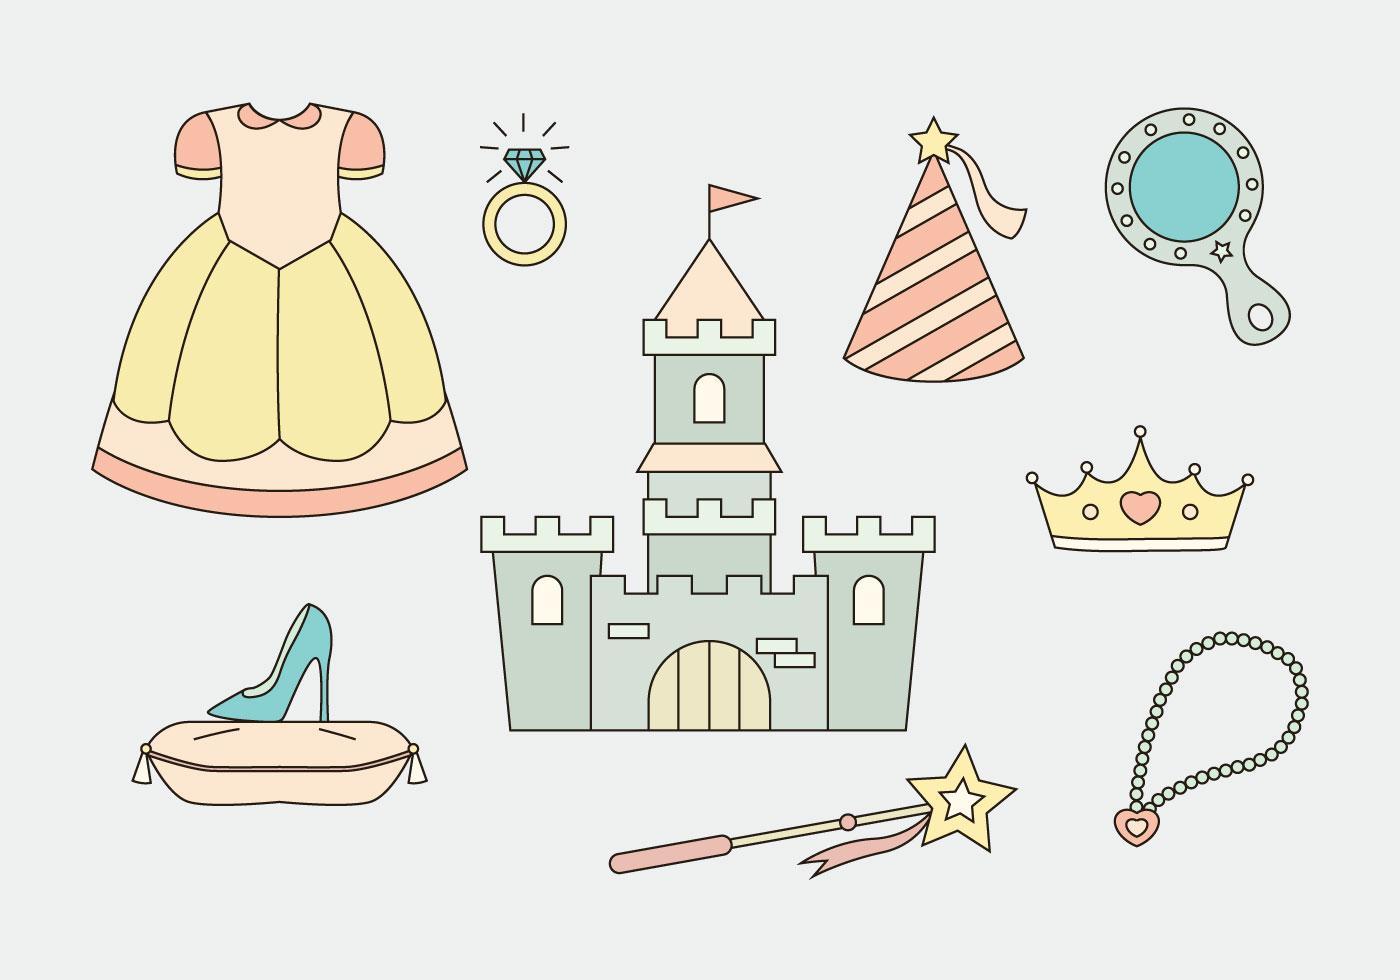 vector free download princess - photo #16